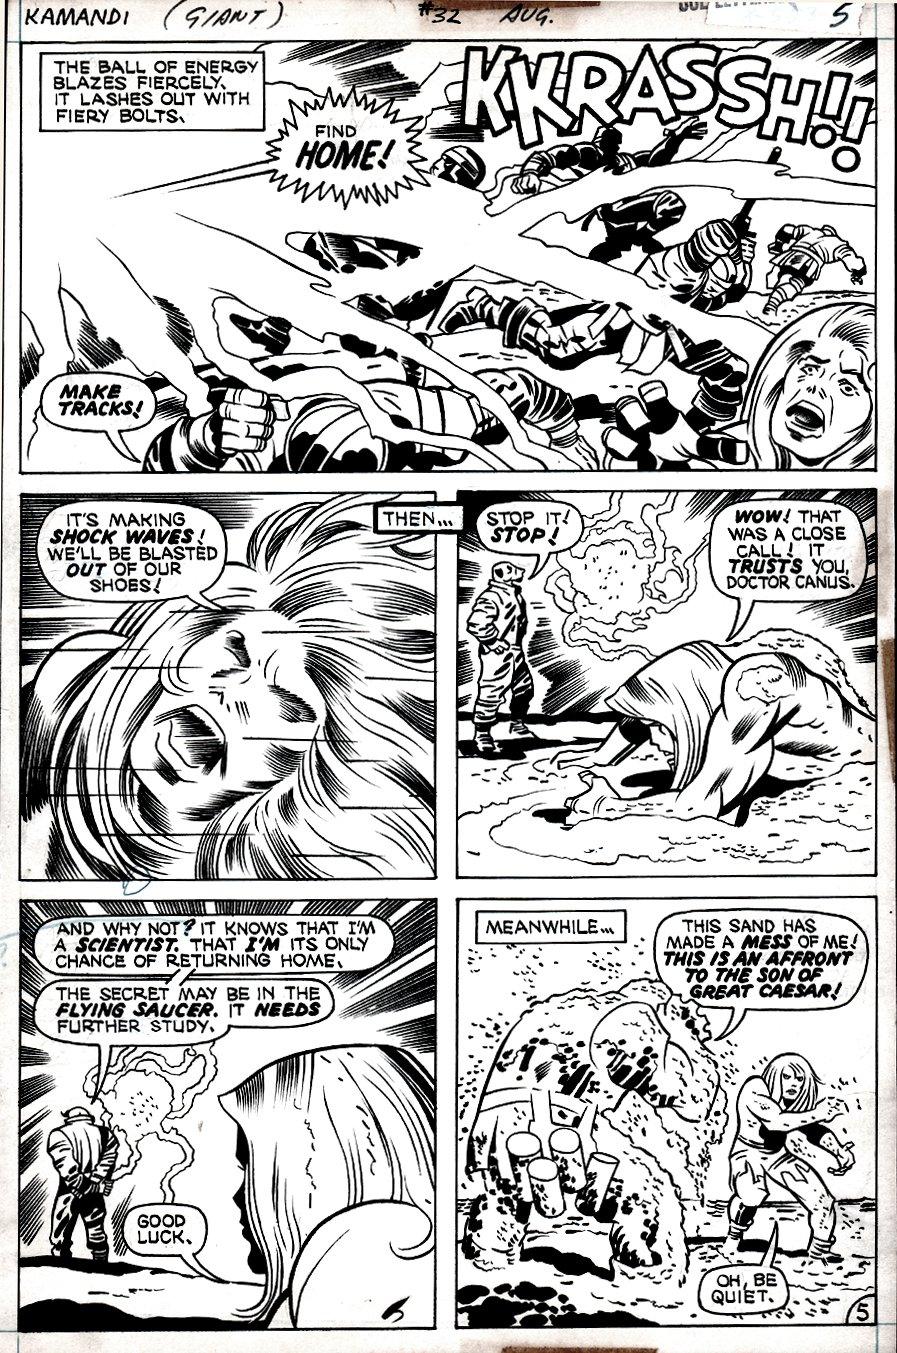 Kamandi #32 p 5 (Kamandi In EVERY PANEL, Dr. Canus, Beastmen!) 1975